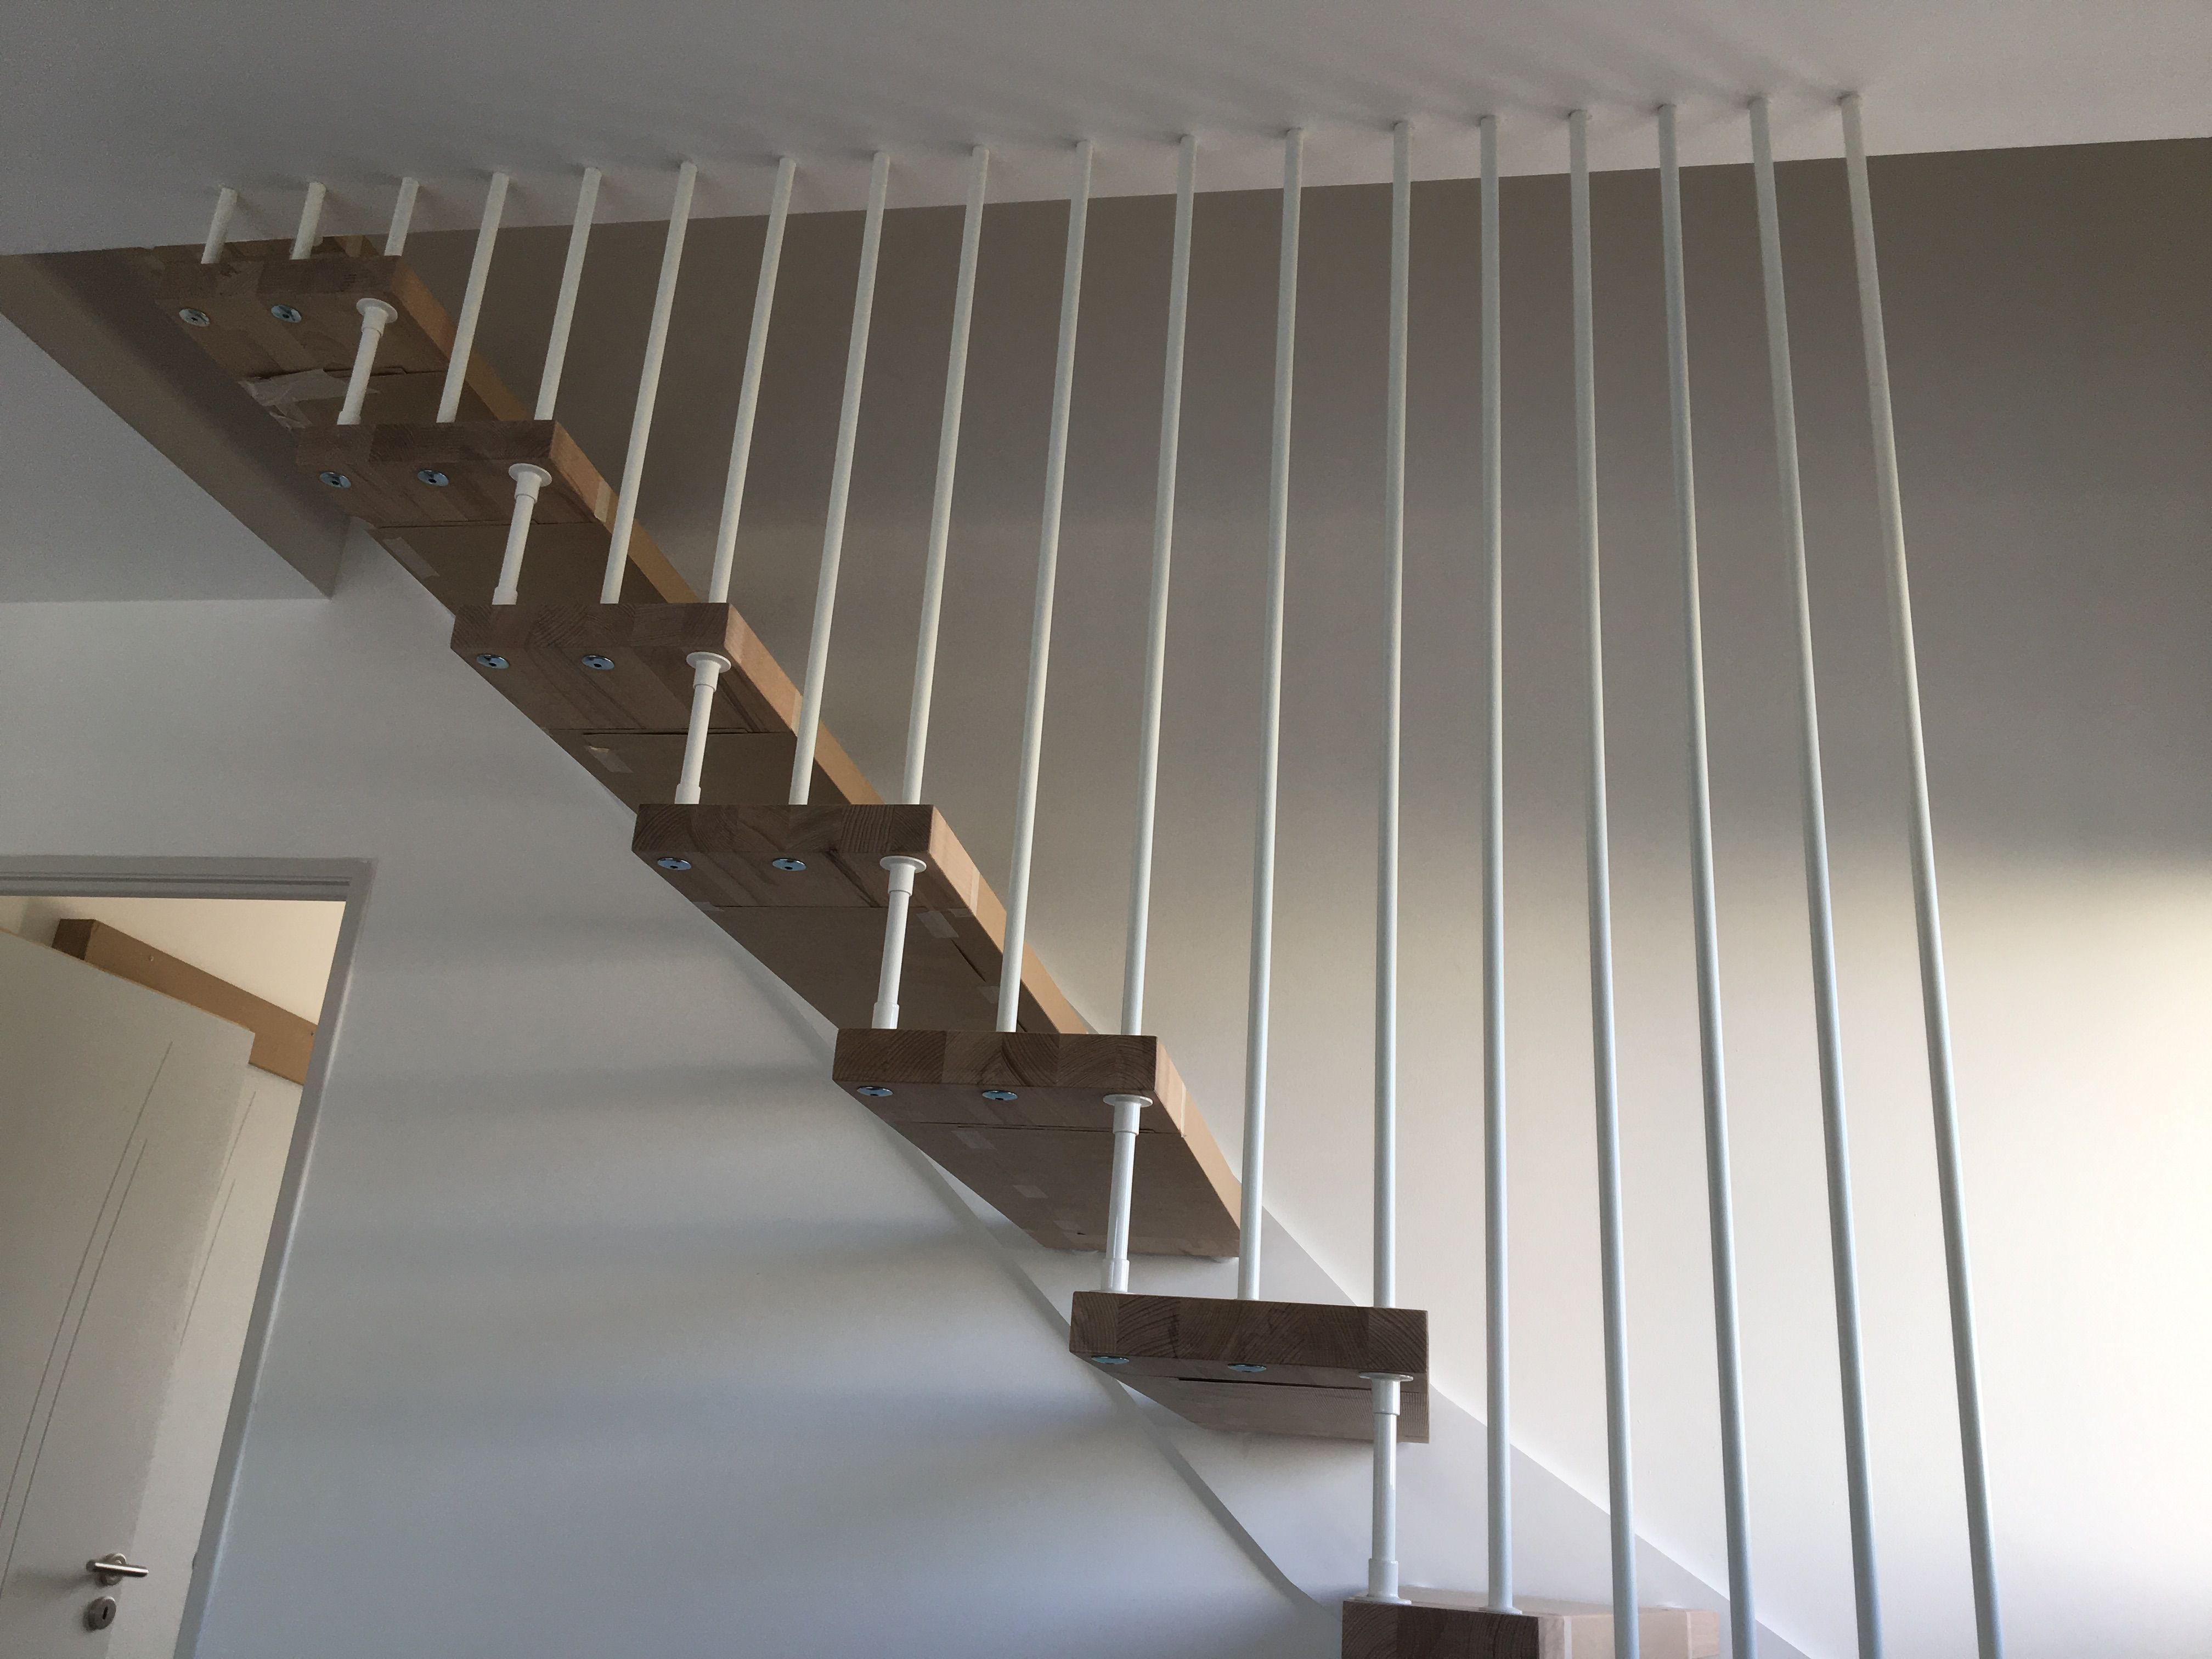 Escalier Nova R6 Avec Harpe Blanche Stairs Decor Home Decor